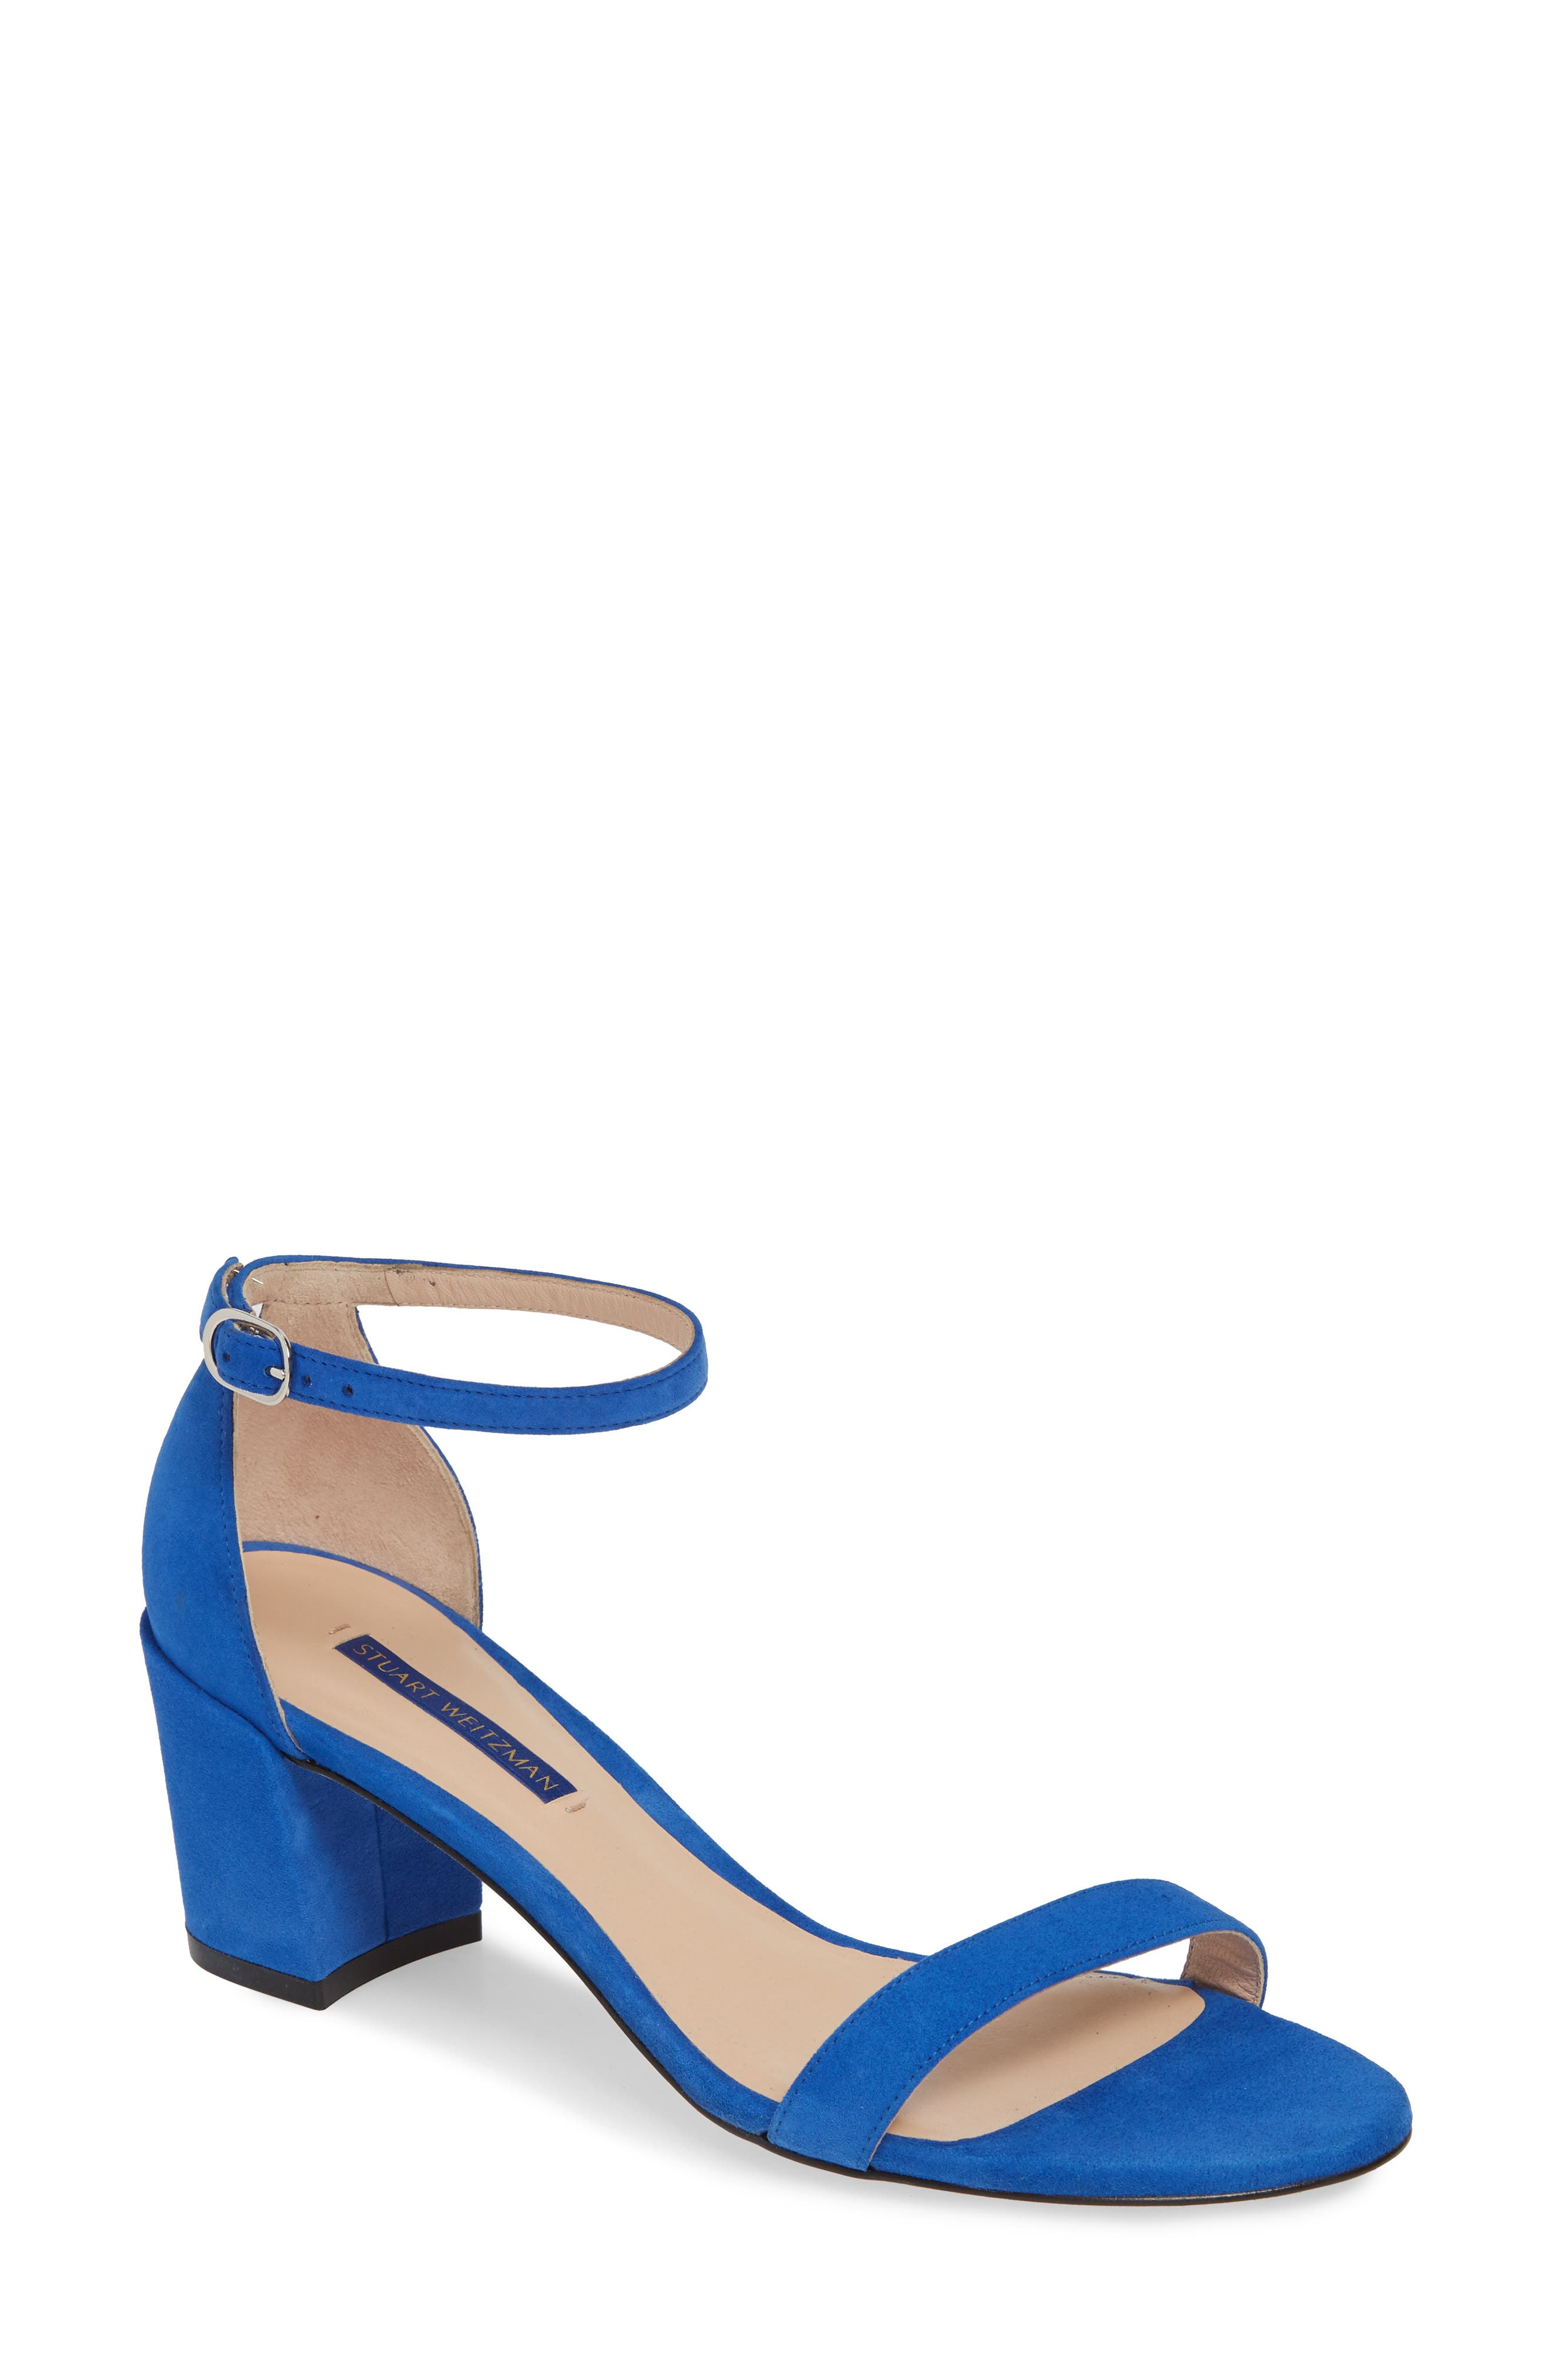 8d1b9b3b5b Women's Block Sandals | Nordstrom